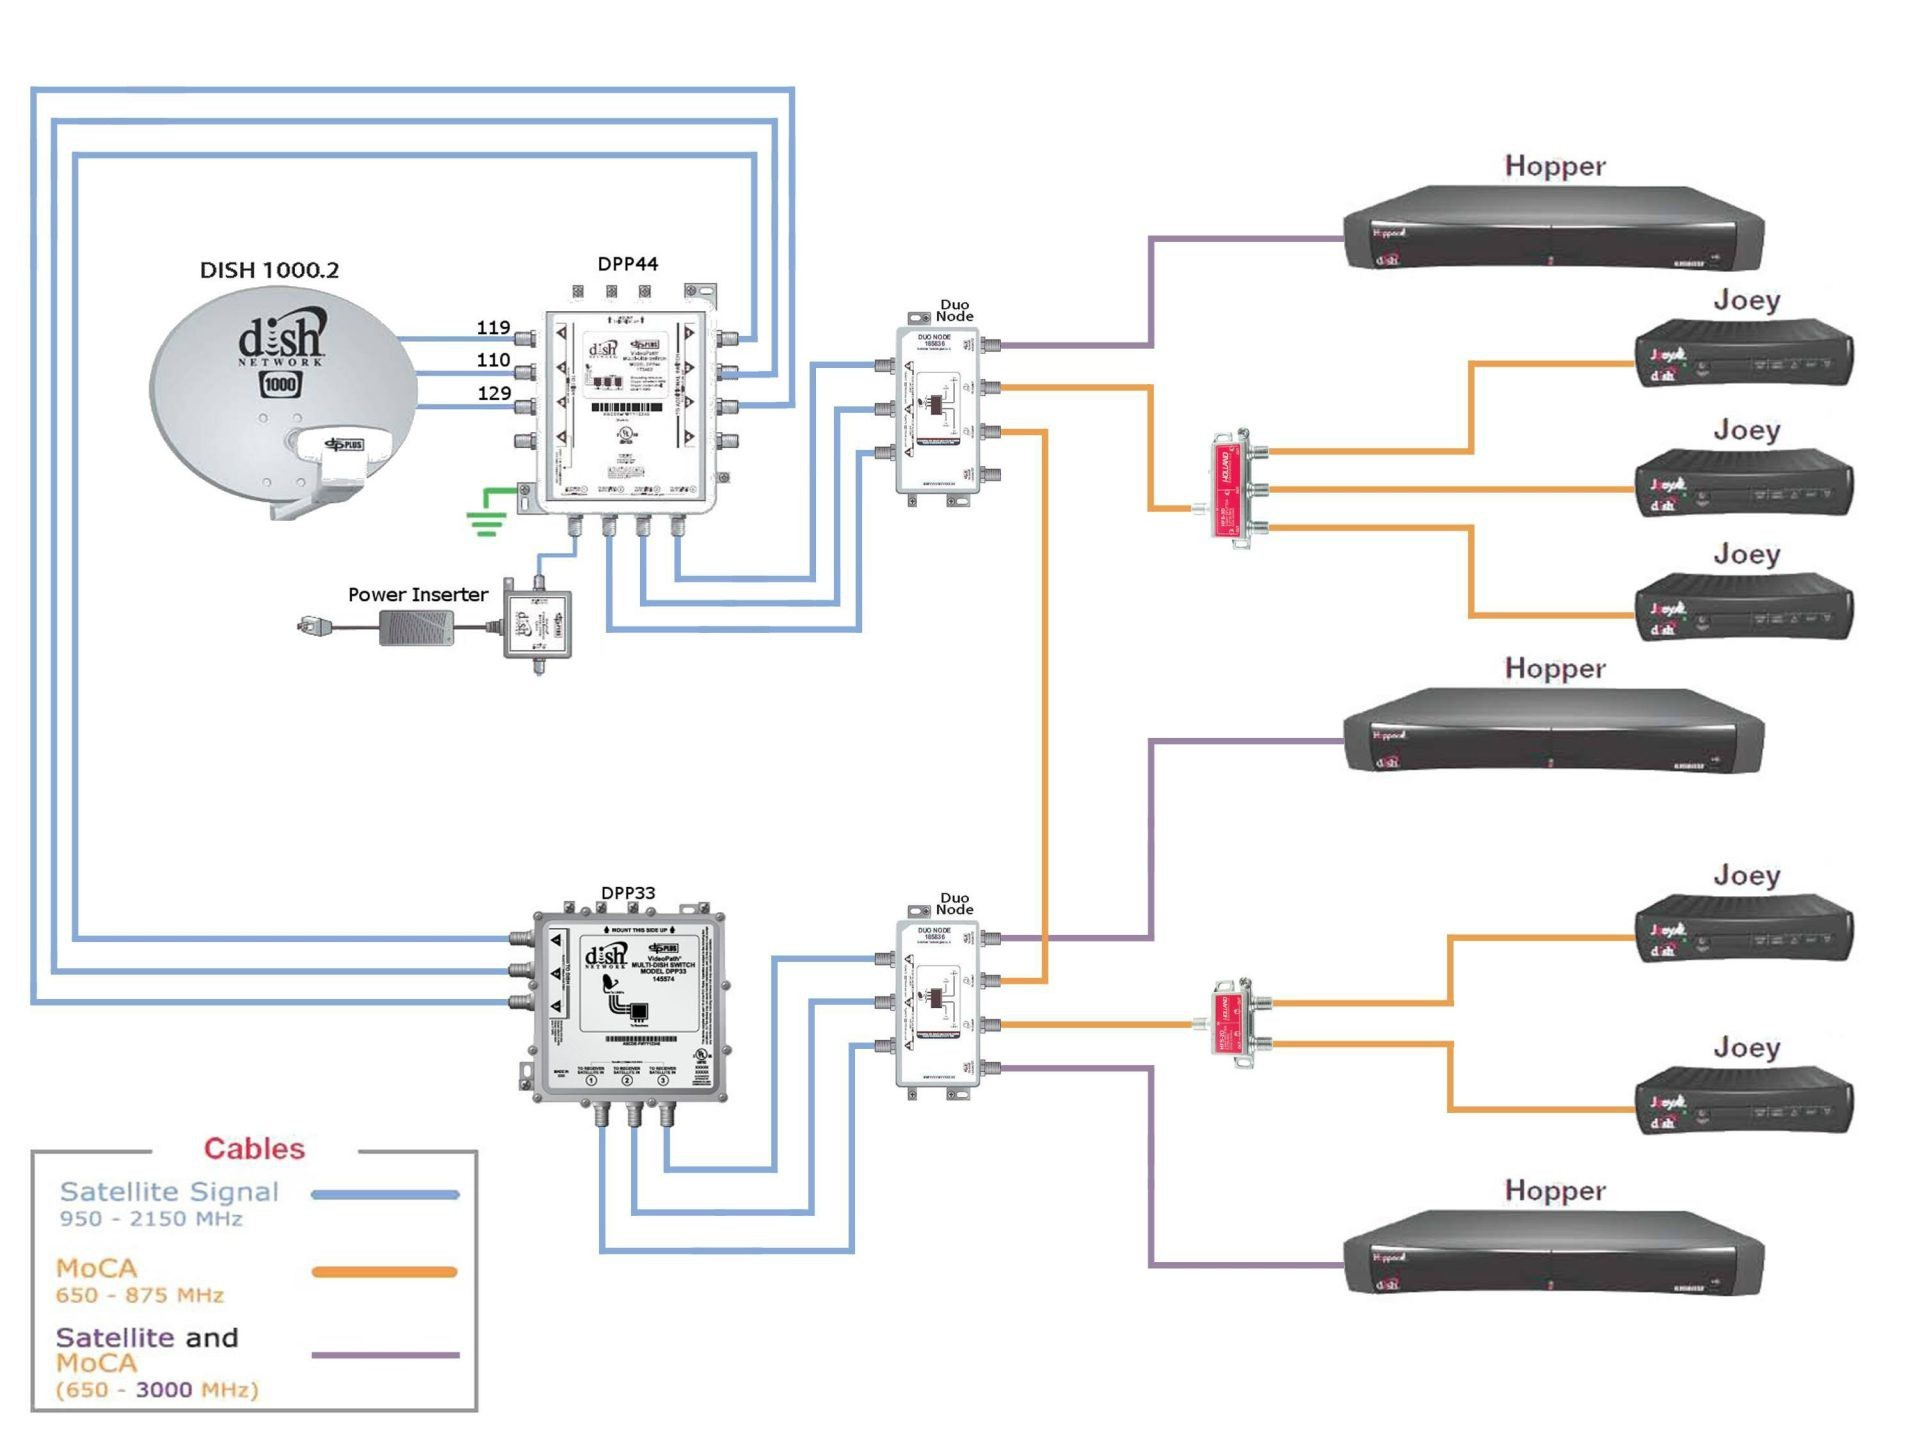 satellite dish wiring diagram elegant rv cable and satellite wiring rh detoxicrecenze com wiring diagram for satellite dishes wiring satellite receiver to dish